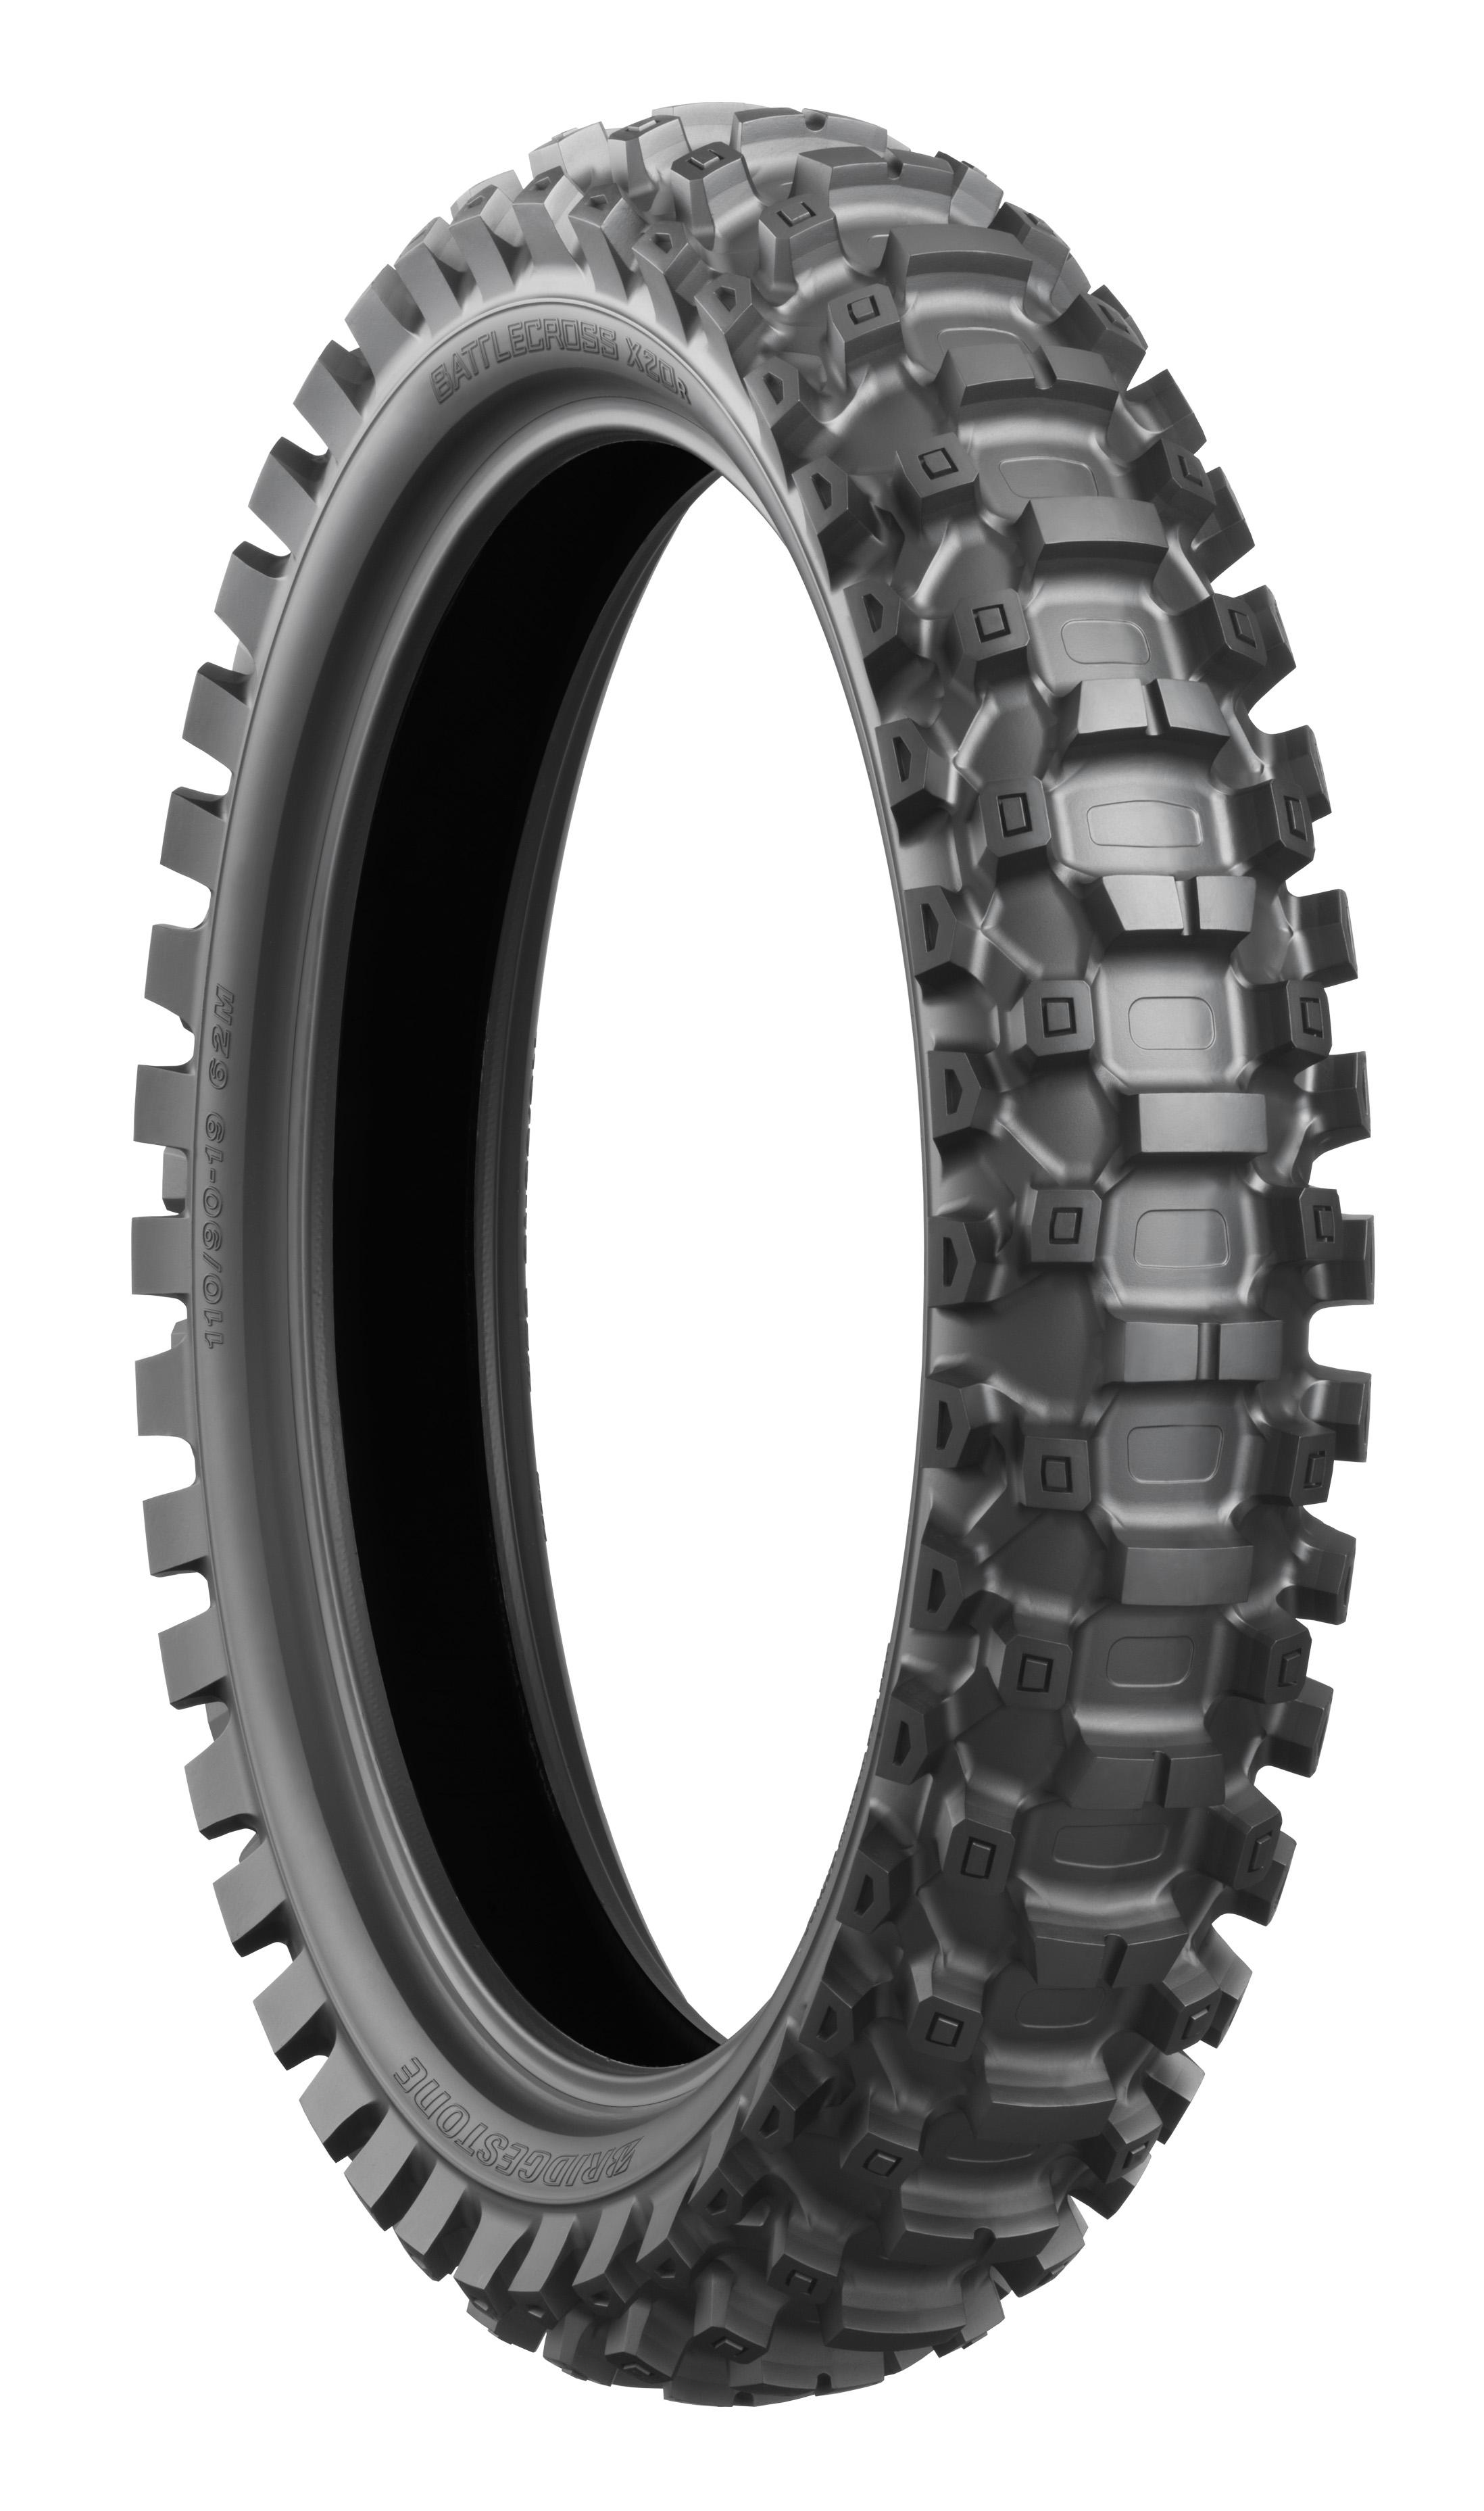 Bridgestone Battlecross X20 110/100-18 (64M) Soft Rear Tyre